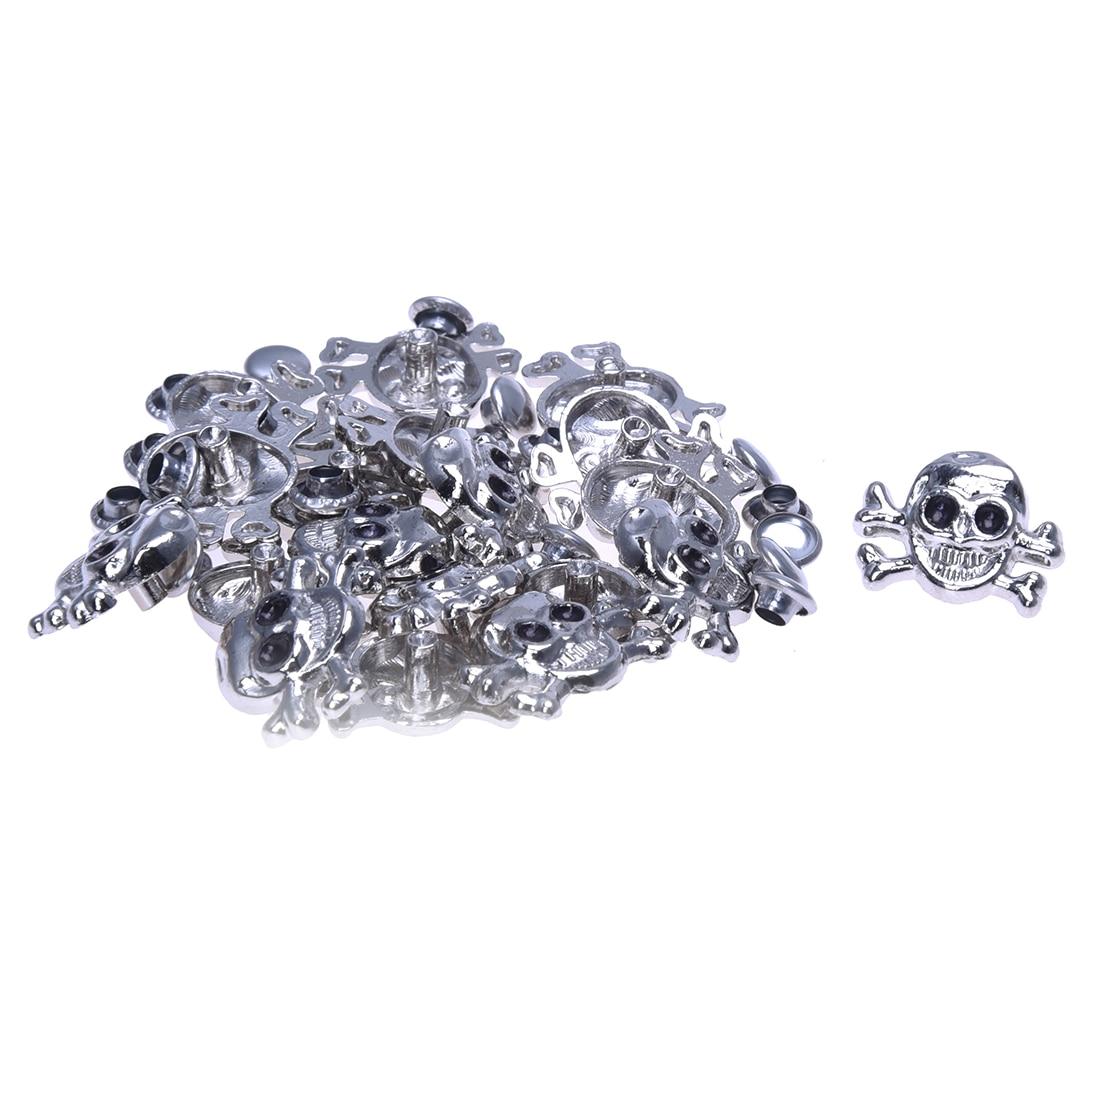 Wholesales 20X Sconces Rivets Skull Metal 14 * 18mm Tacks Bag / Shoes / Gloves